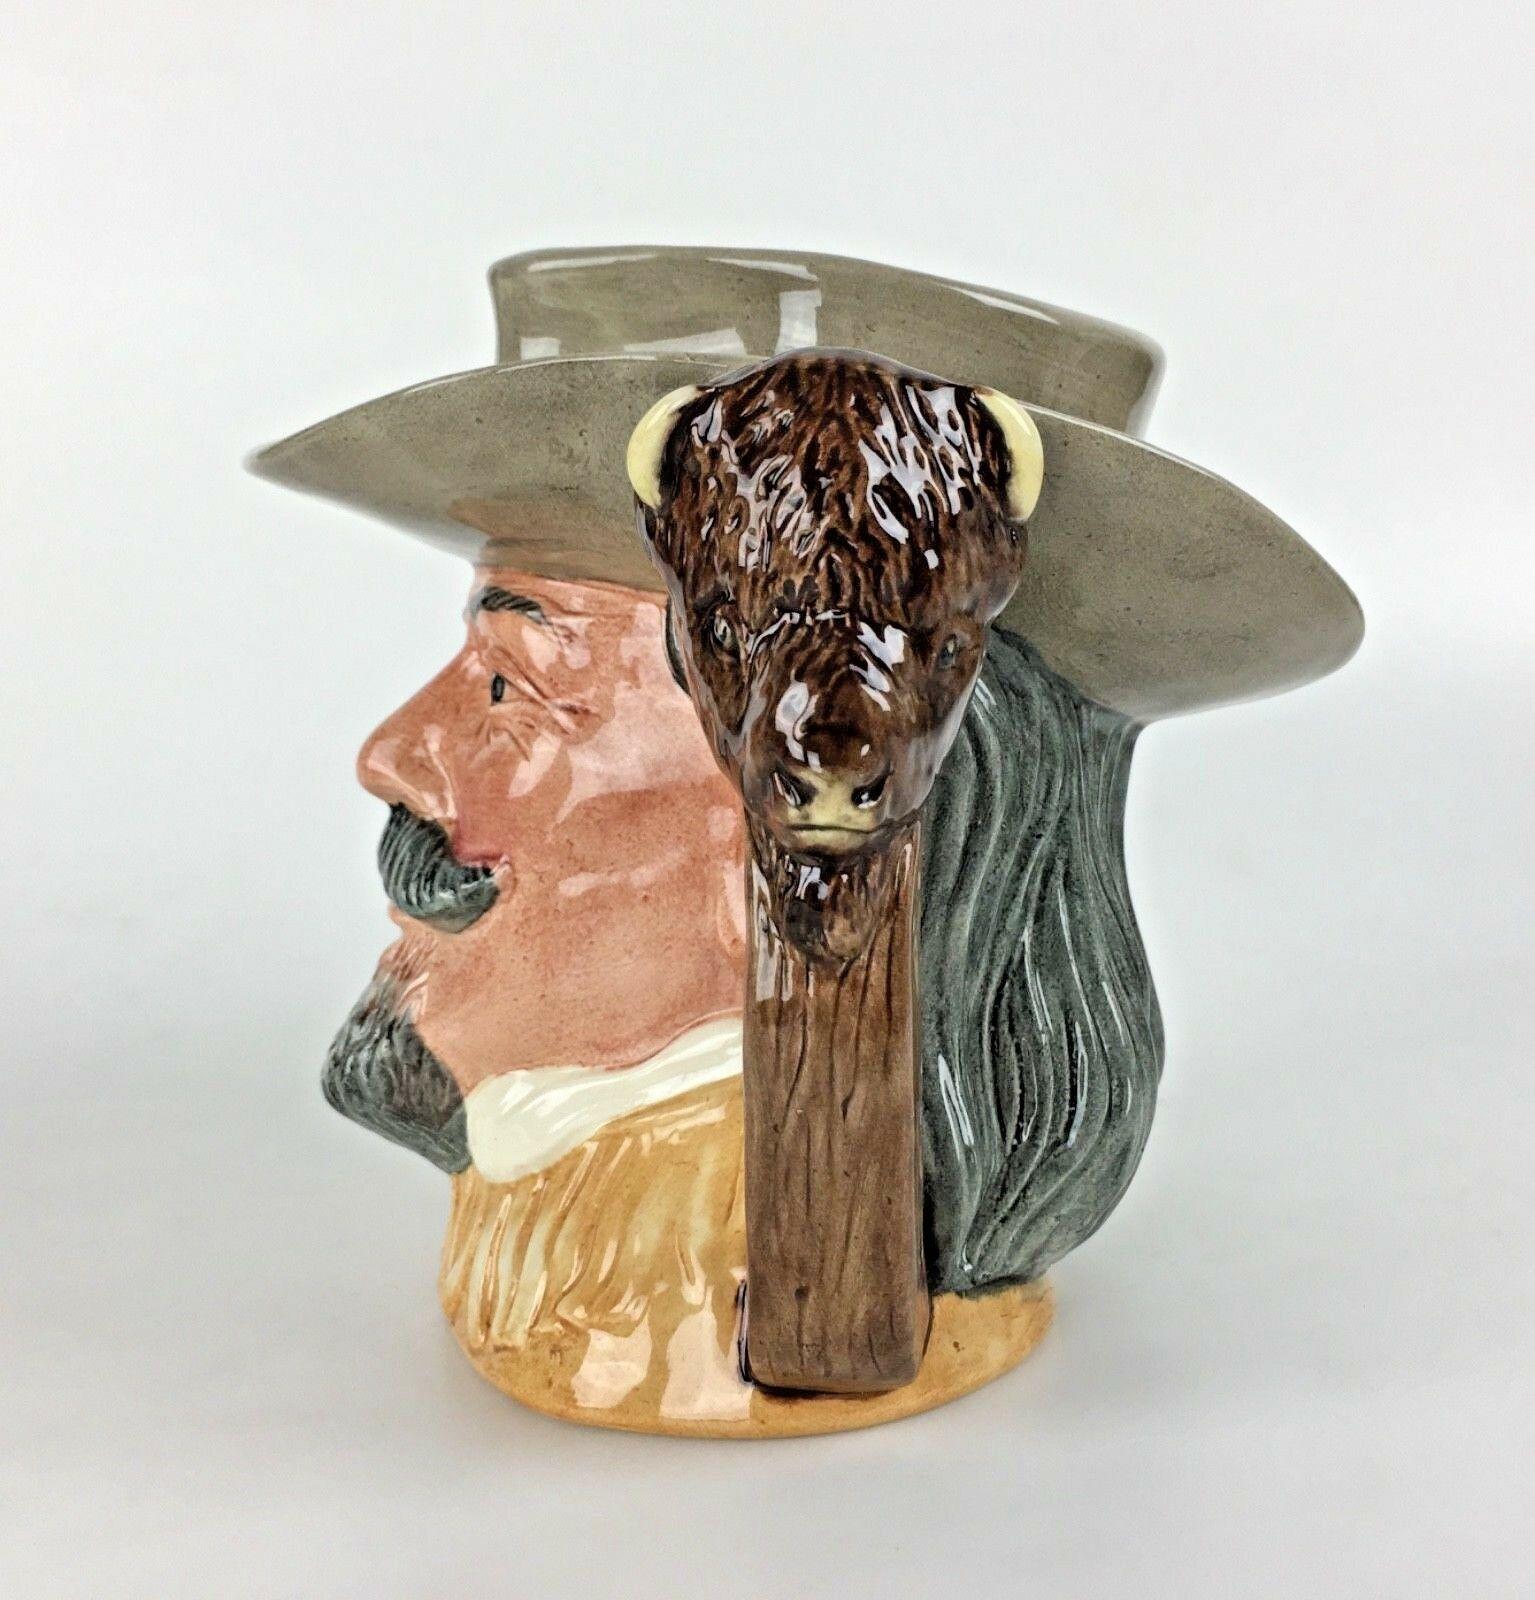 Royal Doulton Buffalo Bill Toby Mug Jug 1984 Wild West D6735 Tabbenor Decor Gift